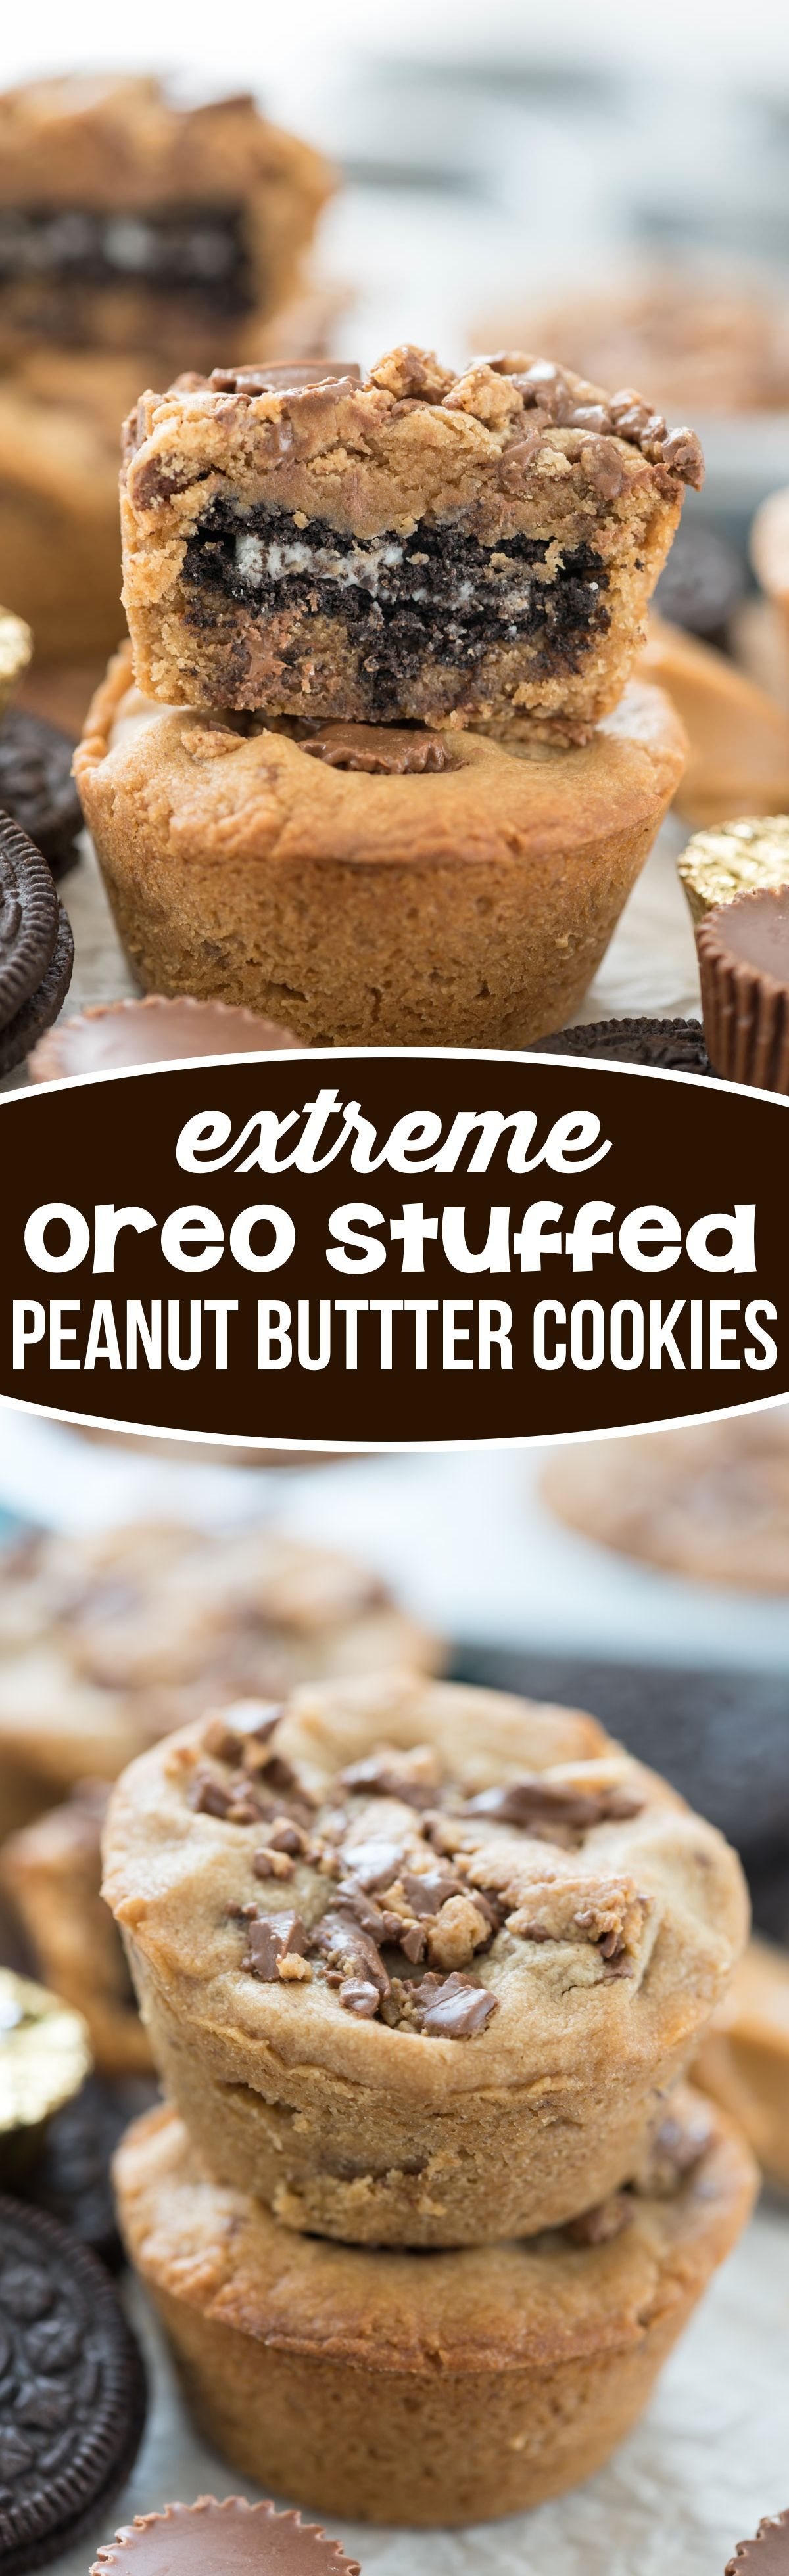 Oreo Stuffed Peanut Butter Cookies - easy cookies stuffed with OREOS and peanut butter cups!